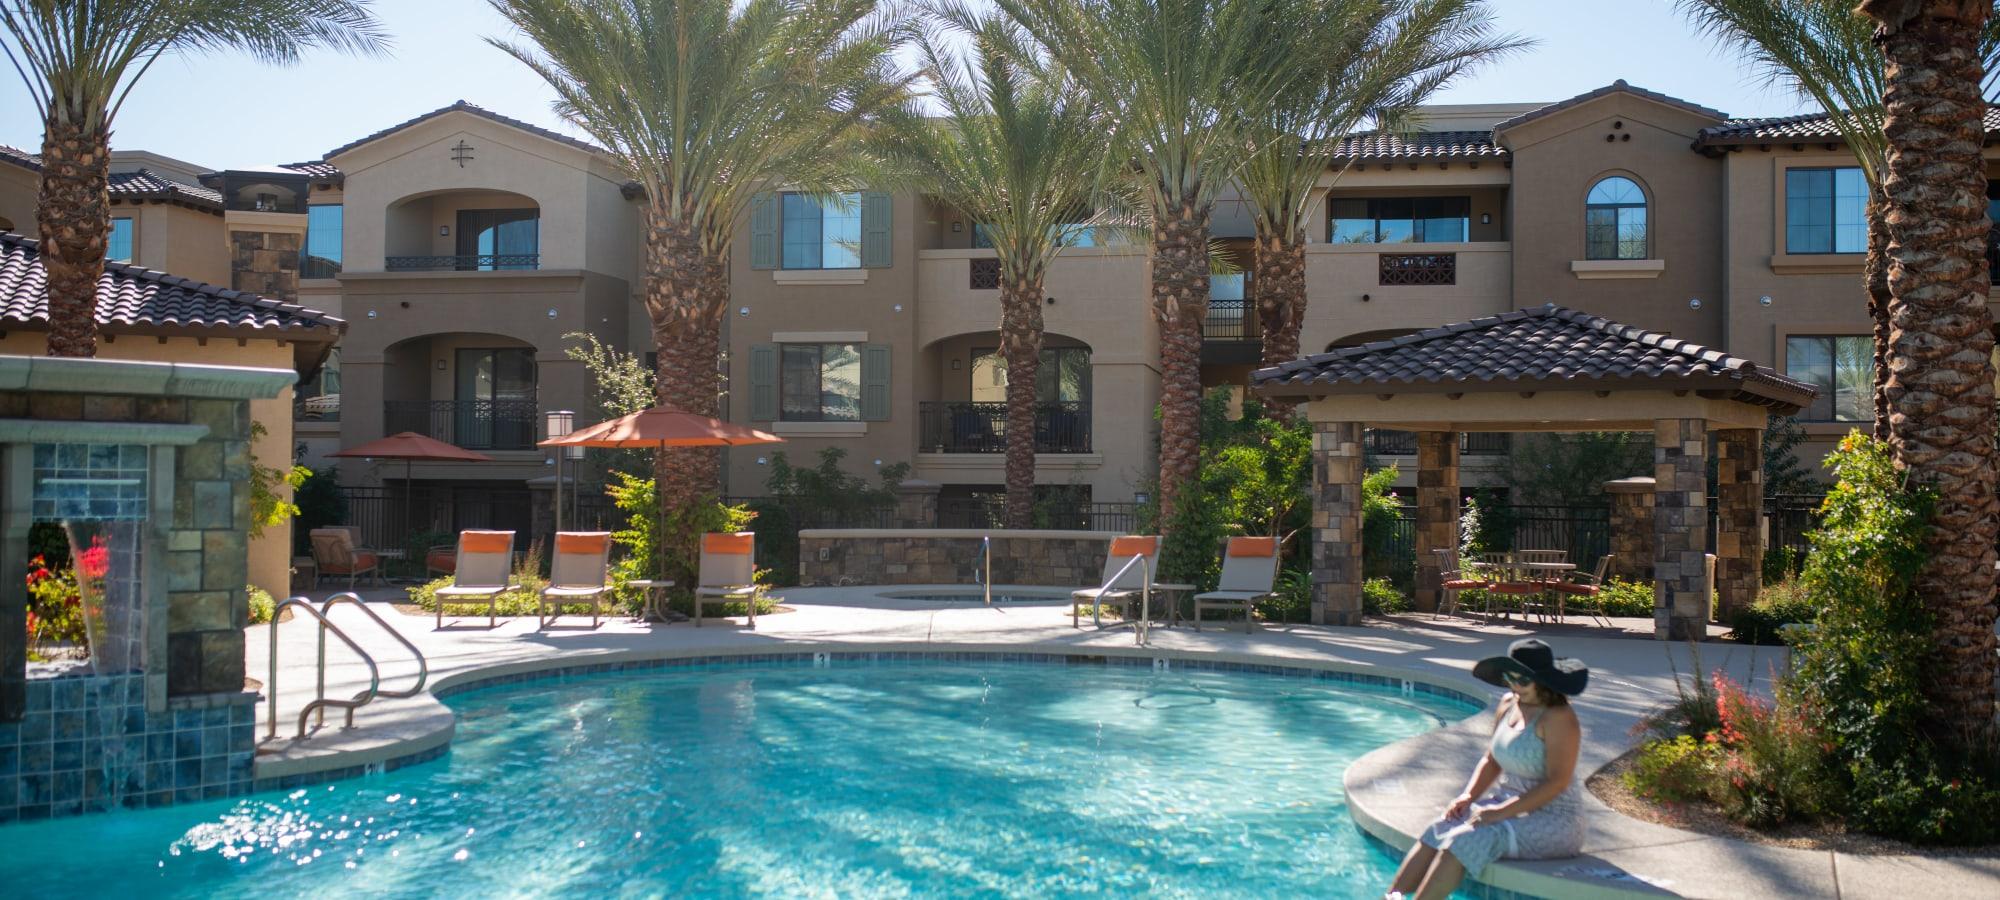 Resort-style swimming pool at BB Living at Val Vista in Gilbert, Arizona